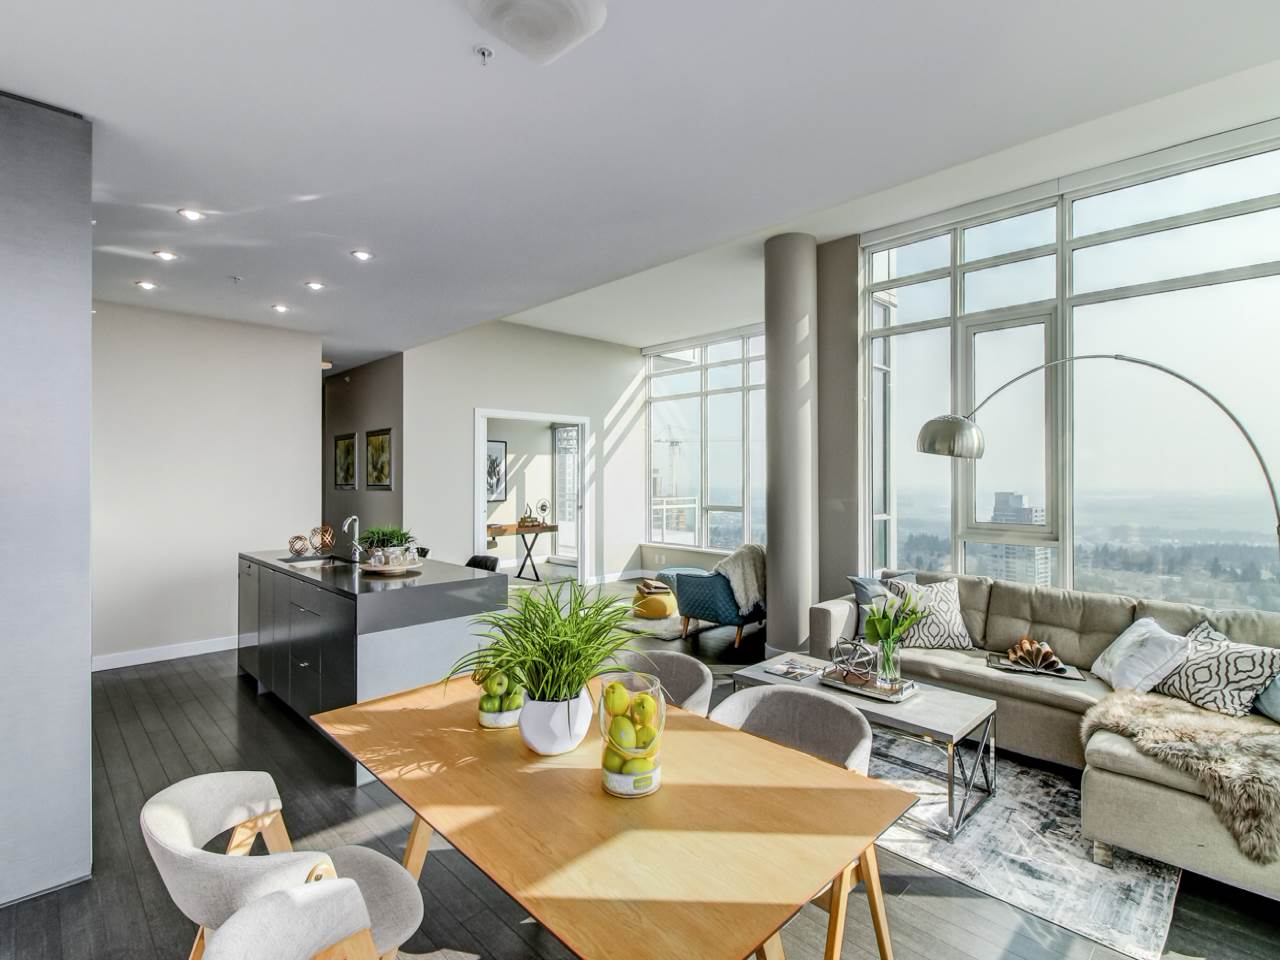 Condo Apartment at 4302 4508 HAZEL STREET, Unit 4302, Burnaby South, British Columbia. Image 2